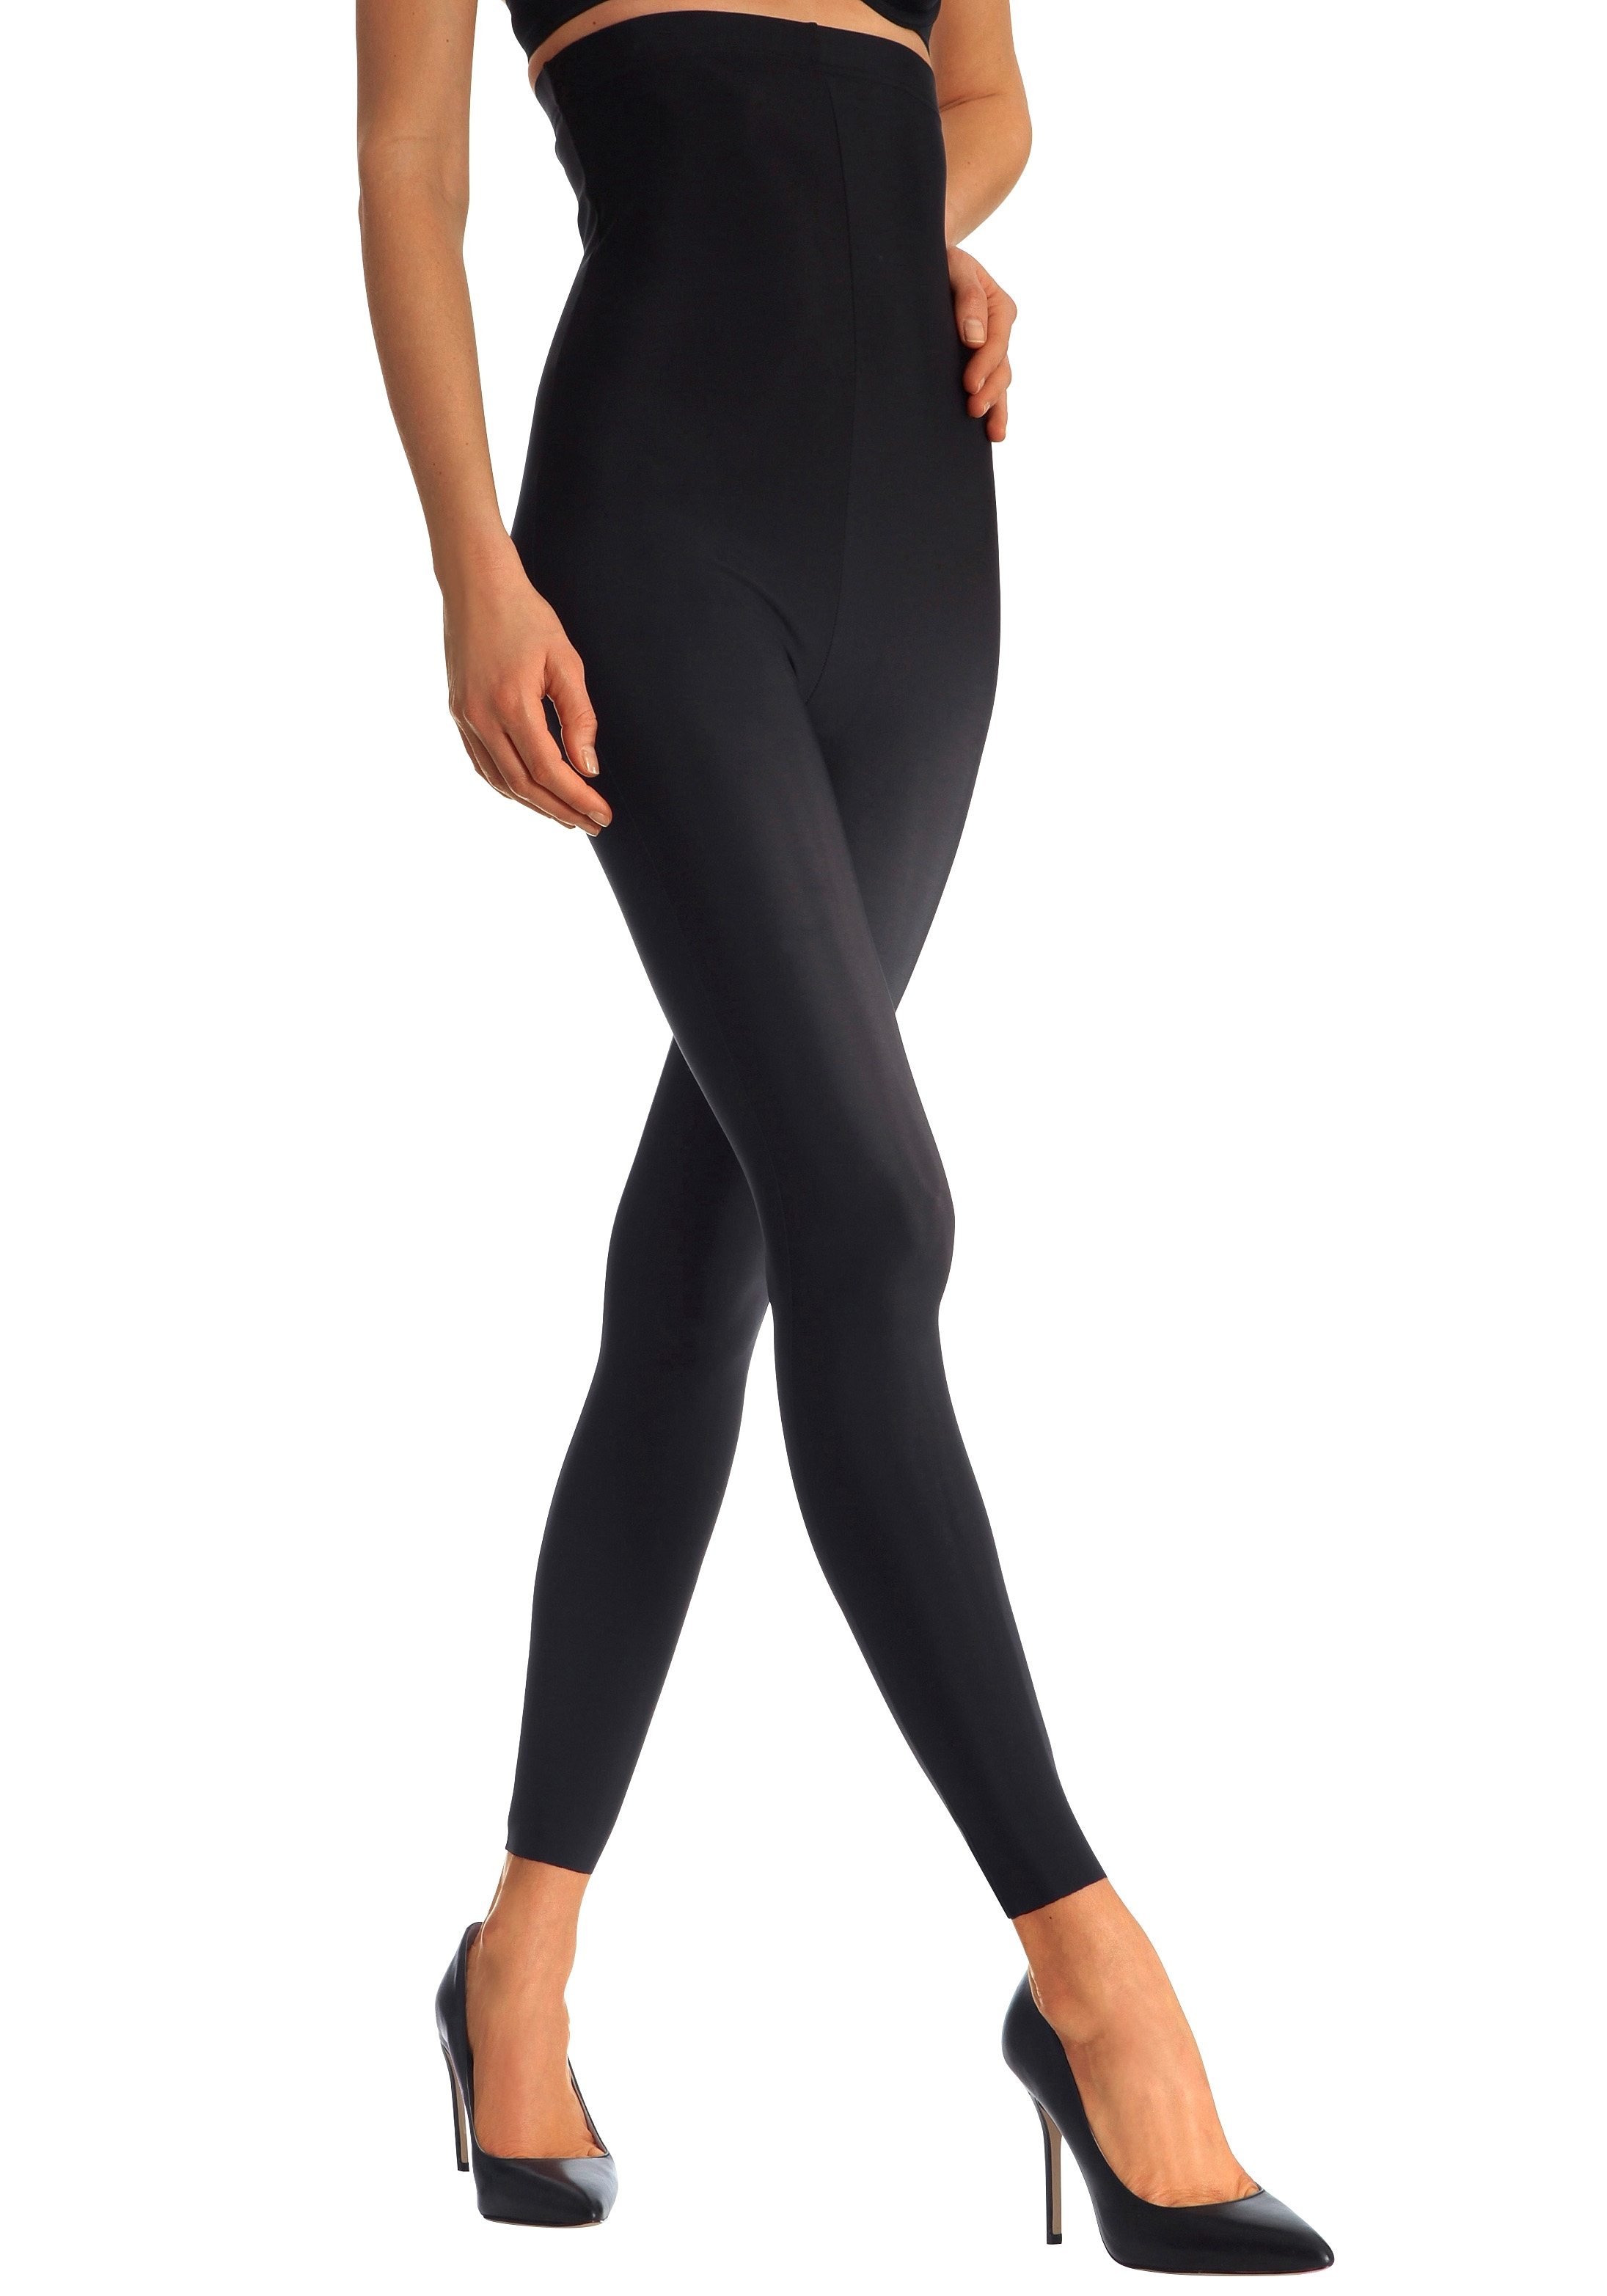 LASCANA high-waisted bodyforming-legging in de webshop van Lascana kopen